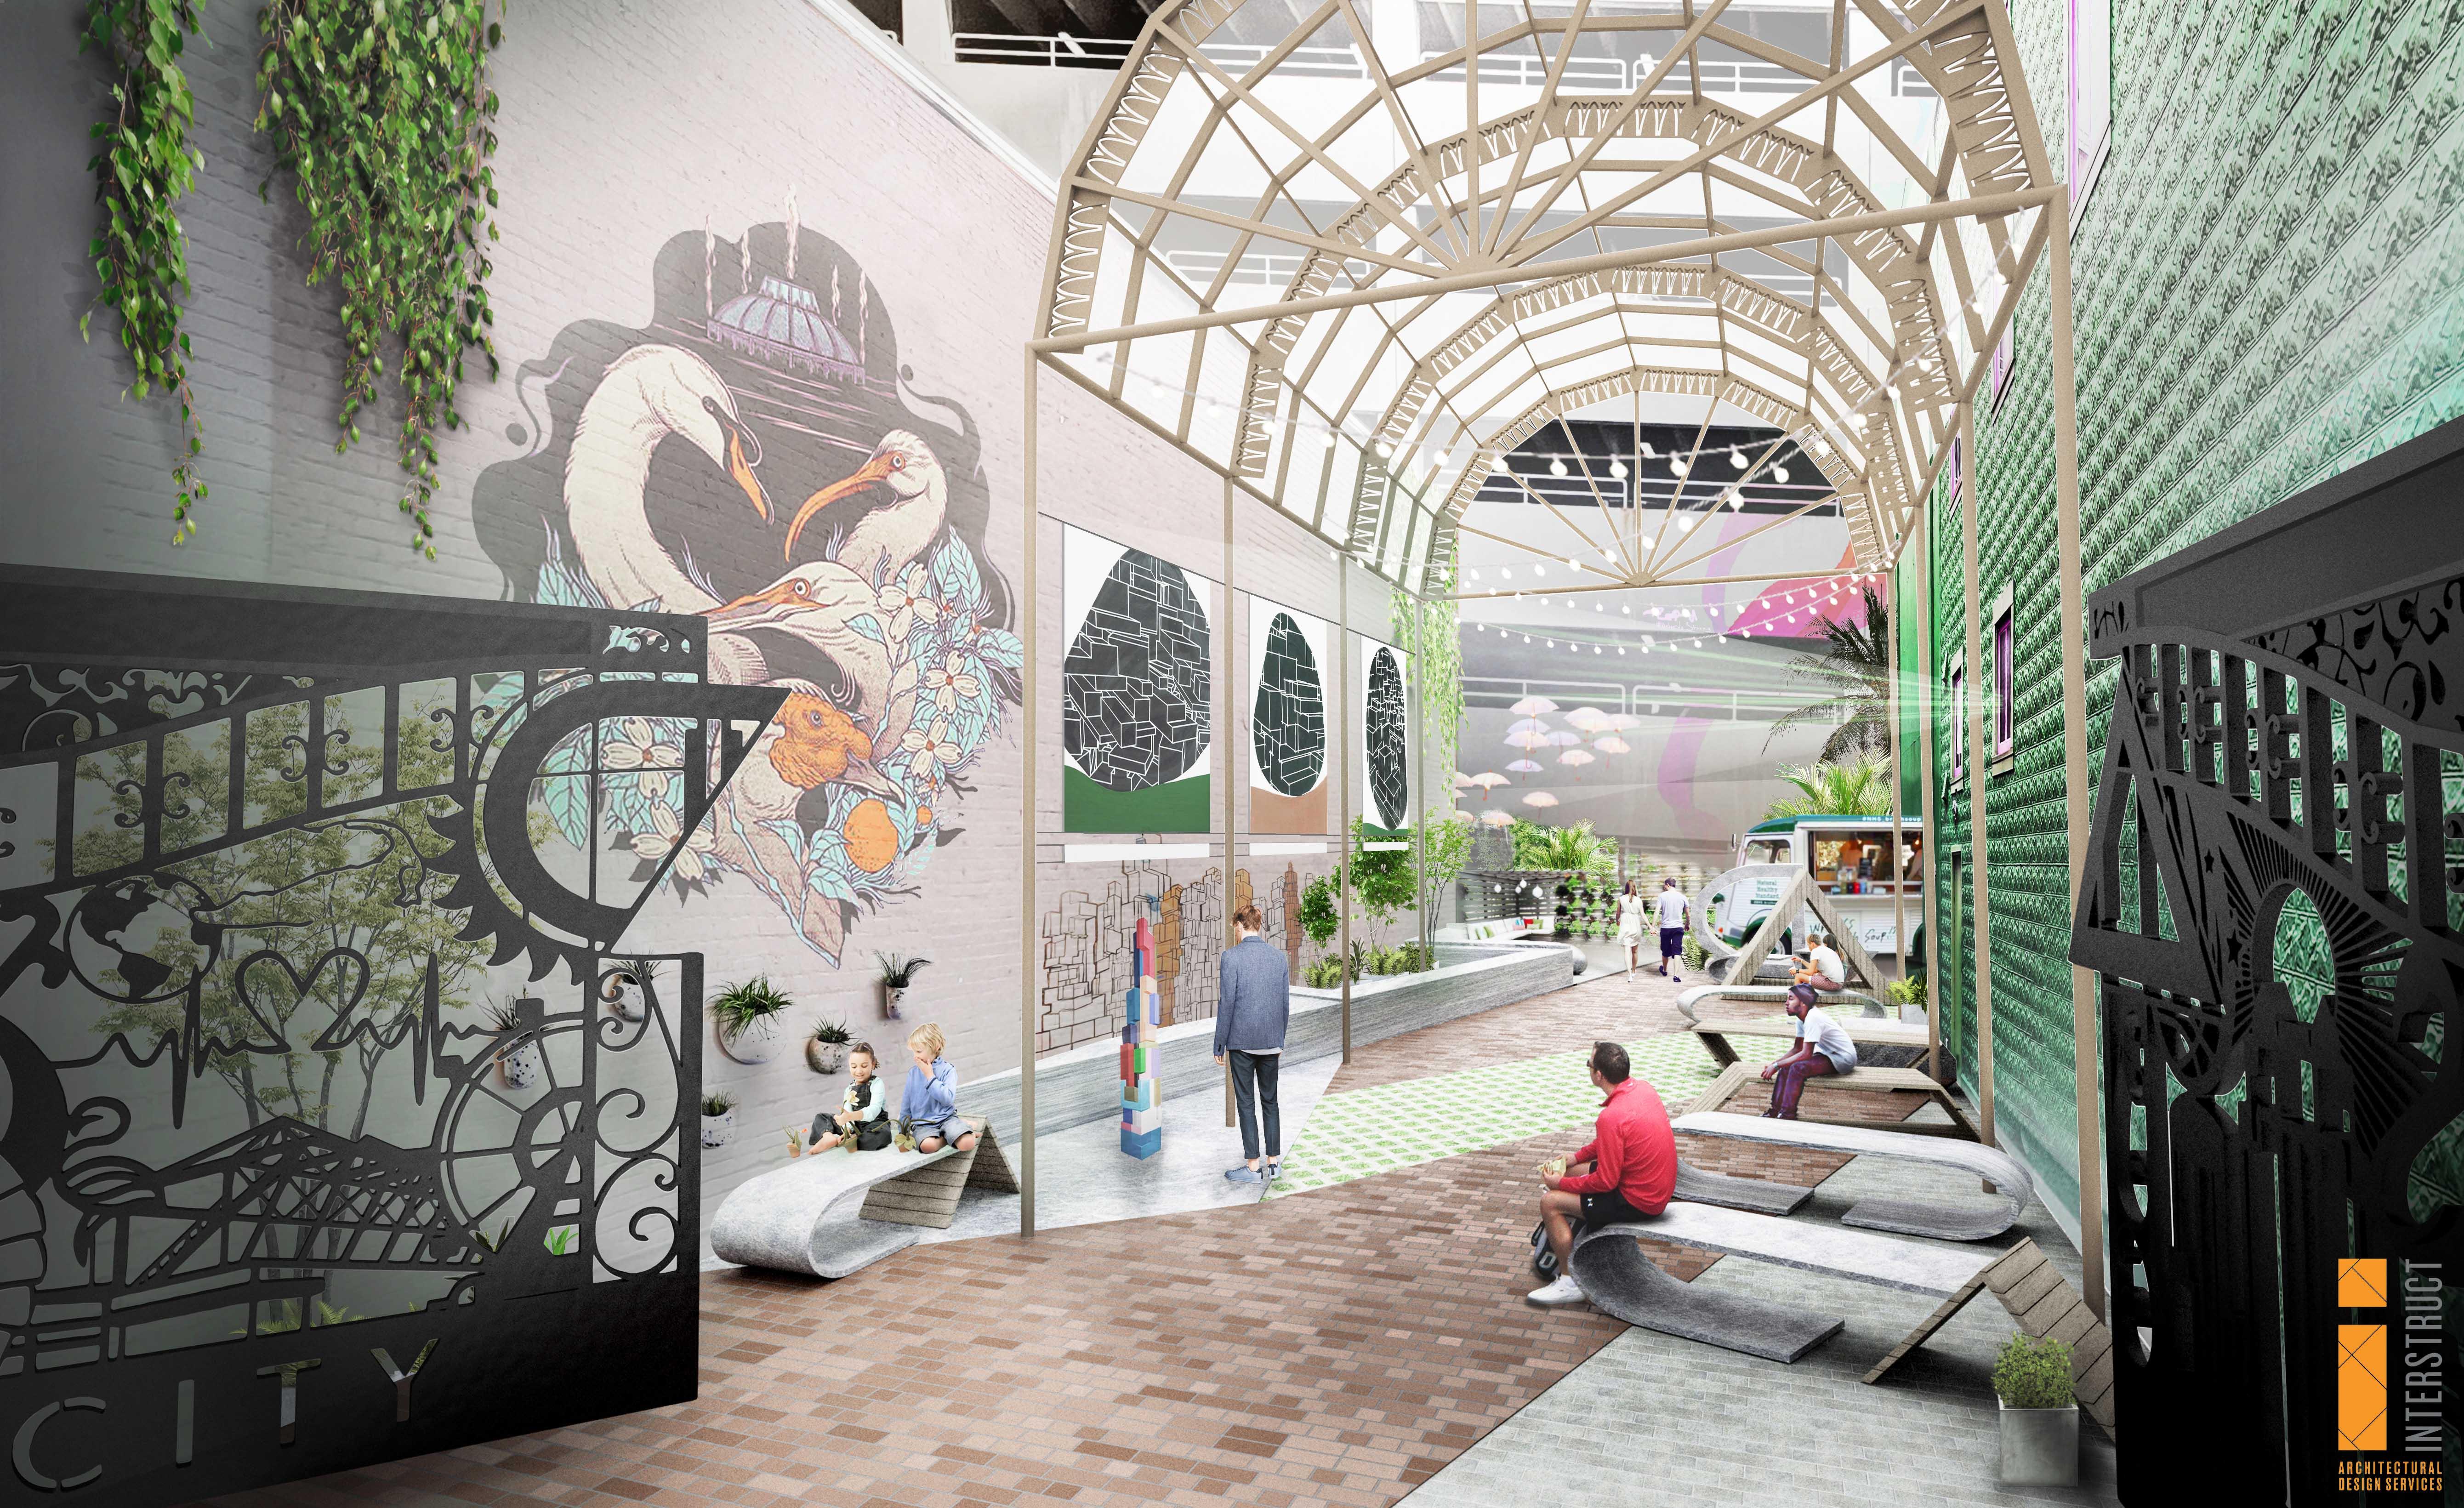 CityArts Courtyard - Interstruct 20200108